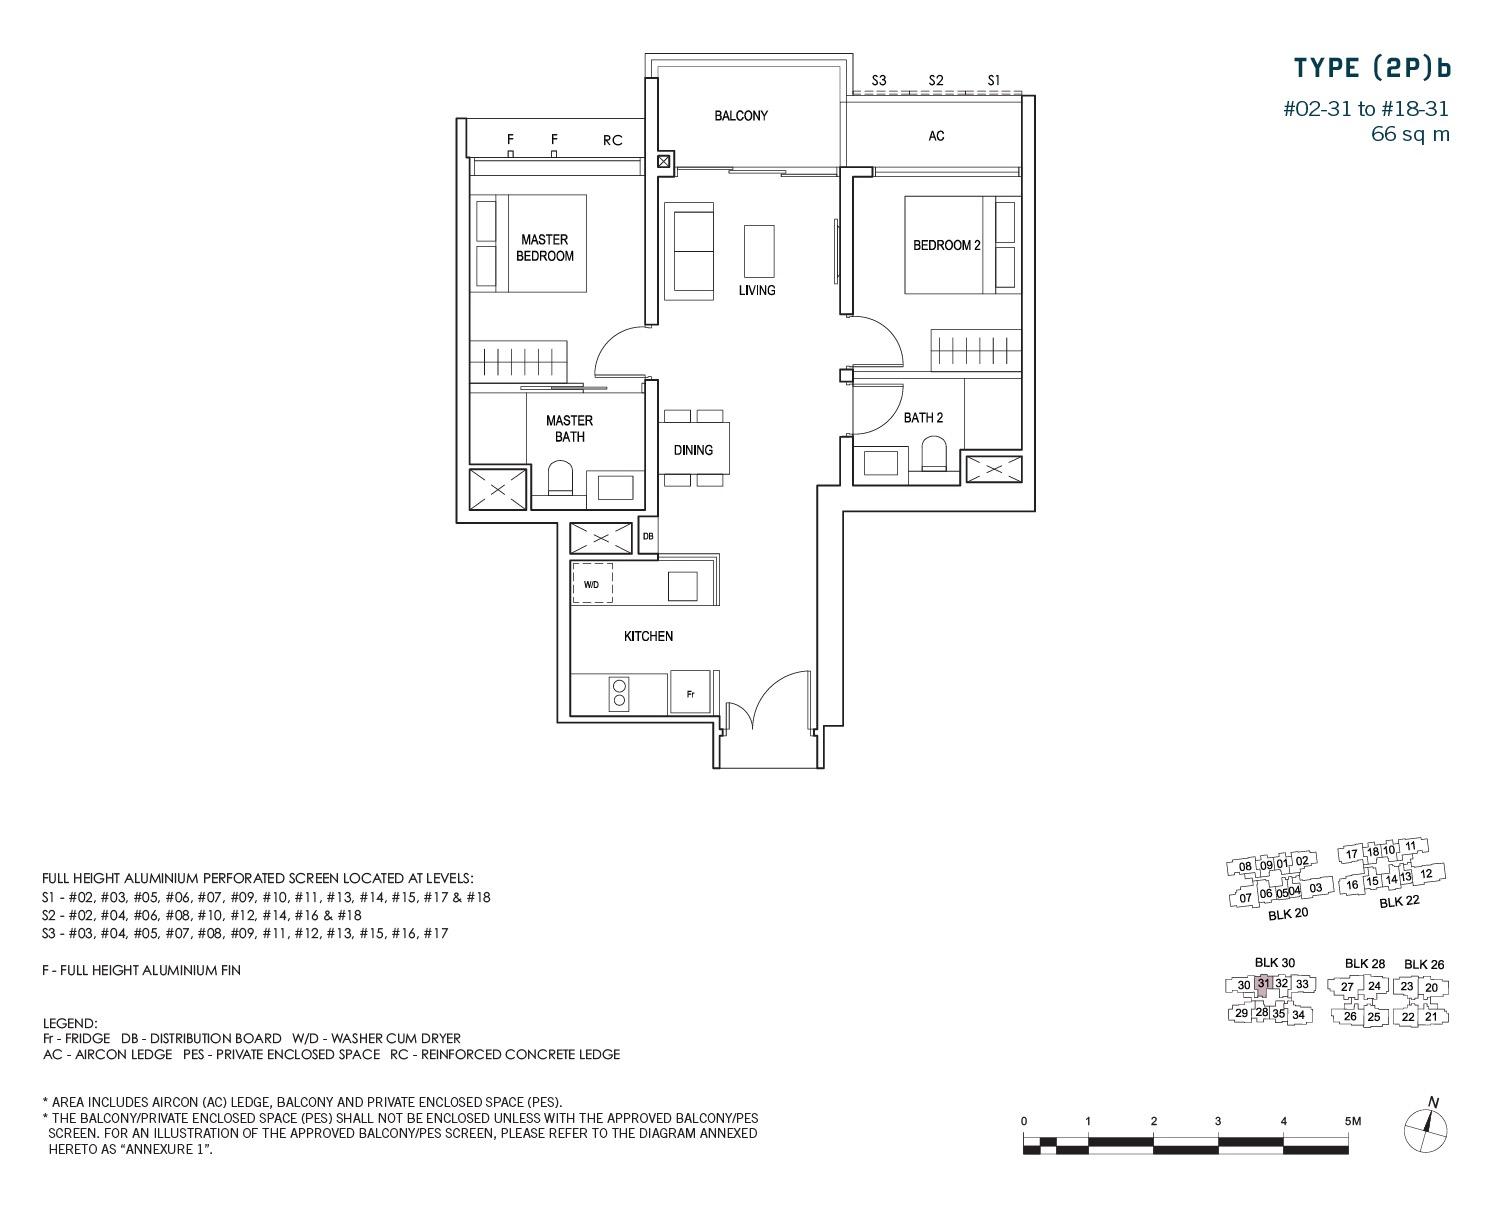 penrose-sims-floorplan 2BR 2Bath B